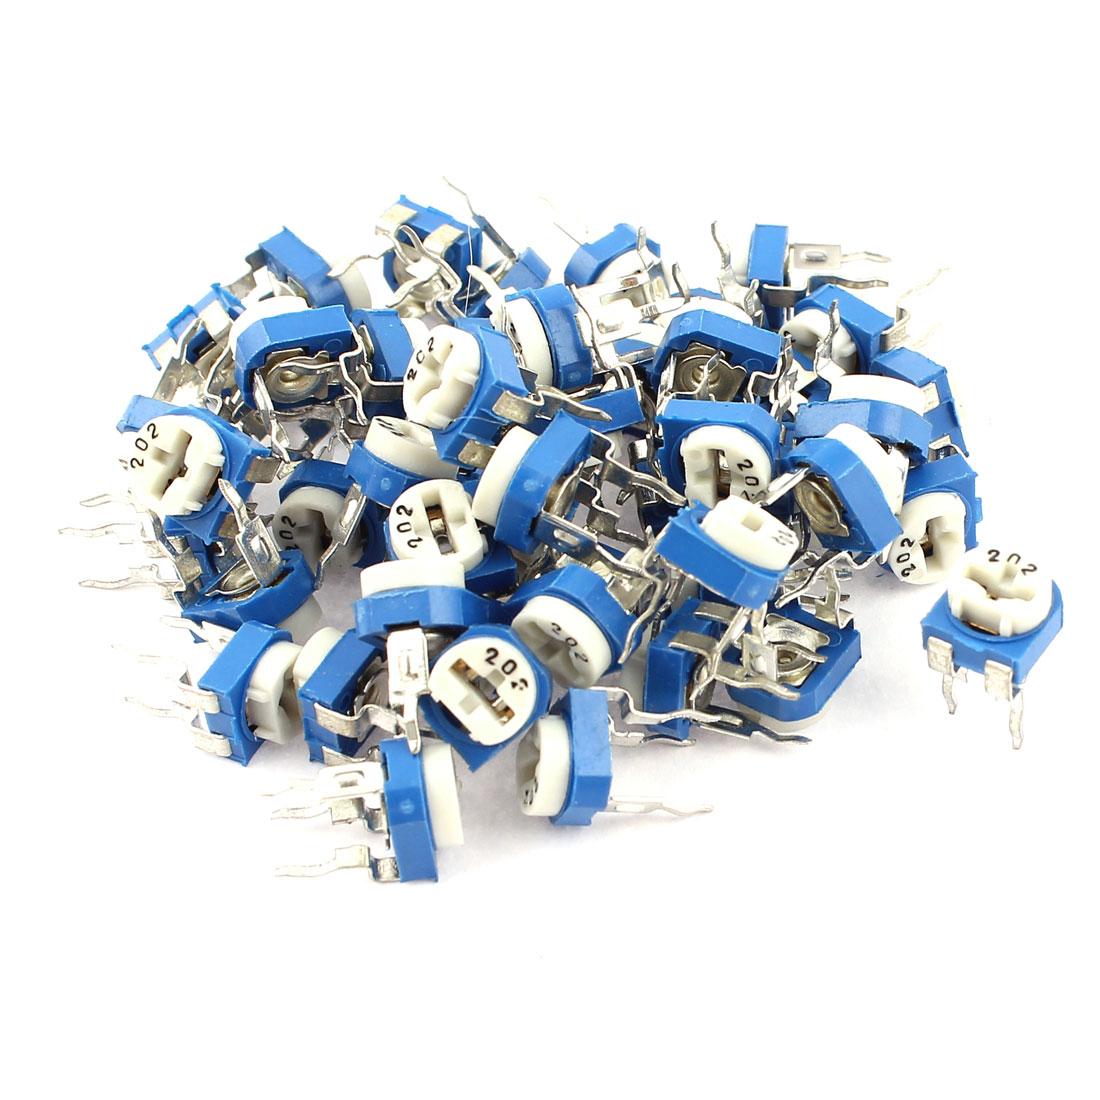 50Pcs 2K ohm Vertical PCB Preset Variable Resistor Trimmer Potentiometer Blue